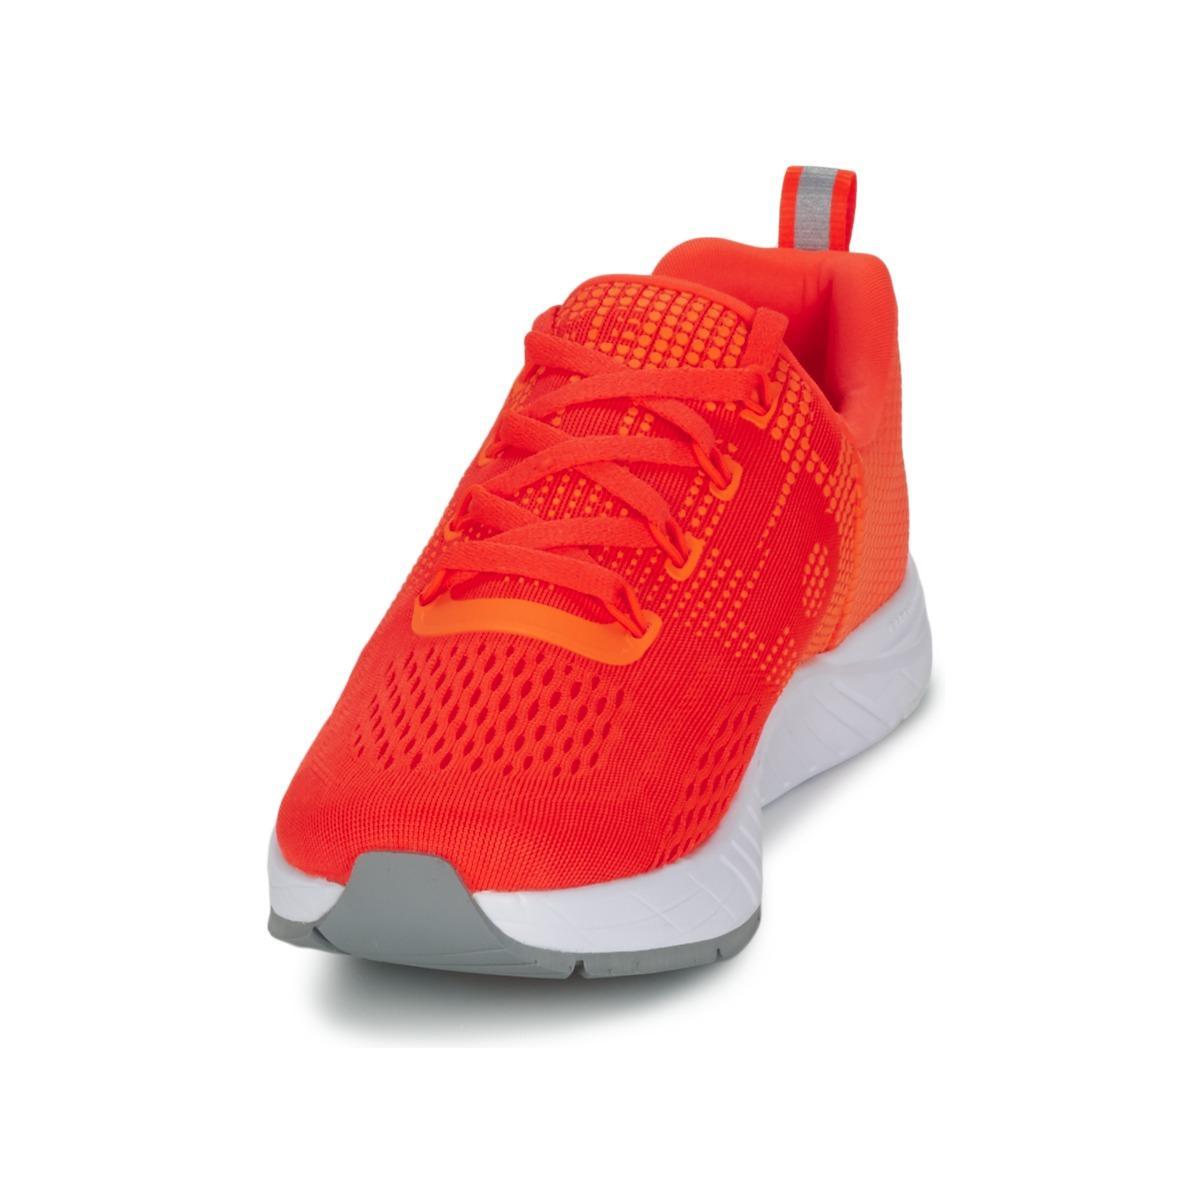 Reebok Cardio Pump Fusion Trainers in Orange